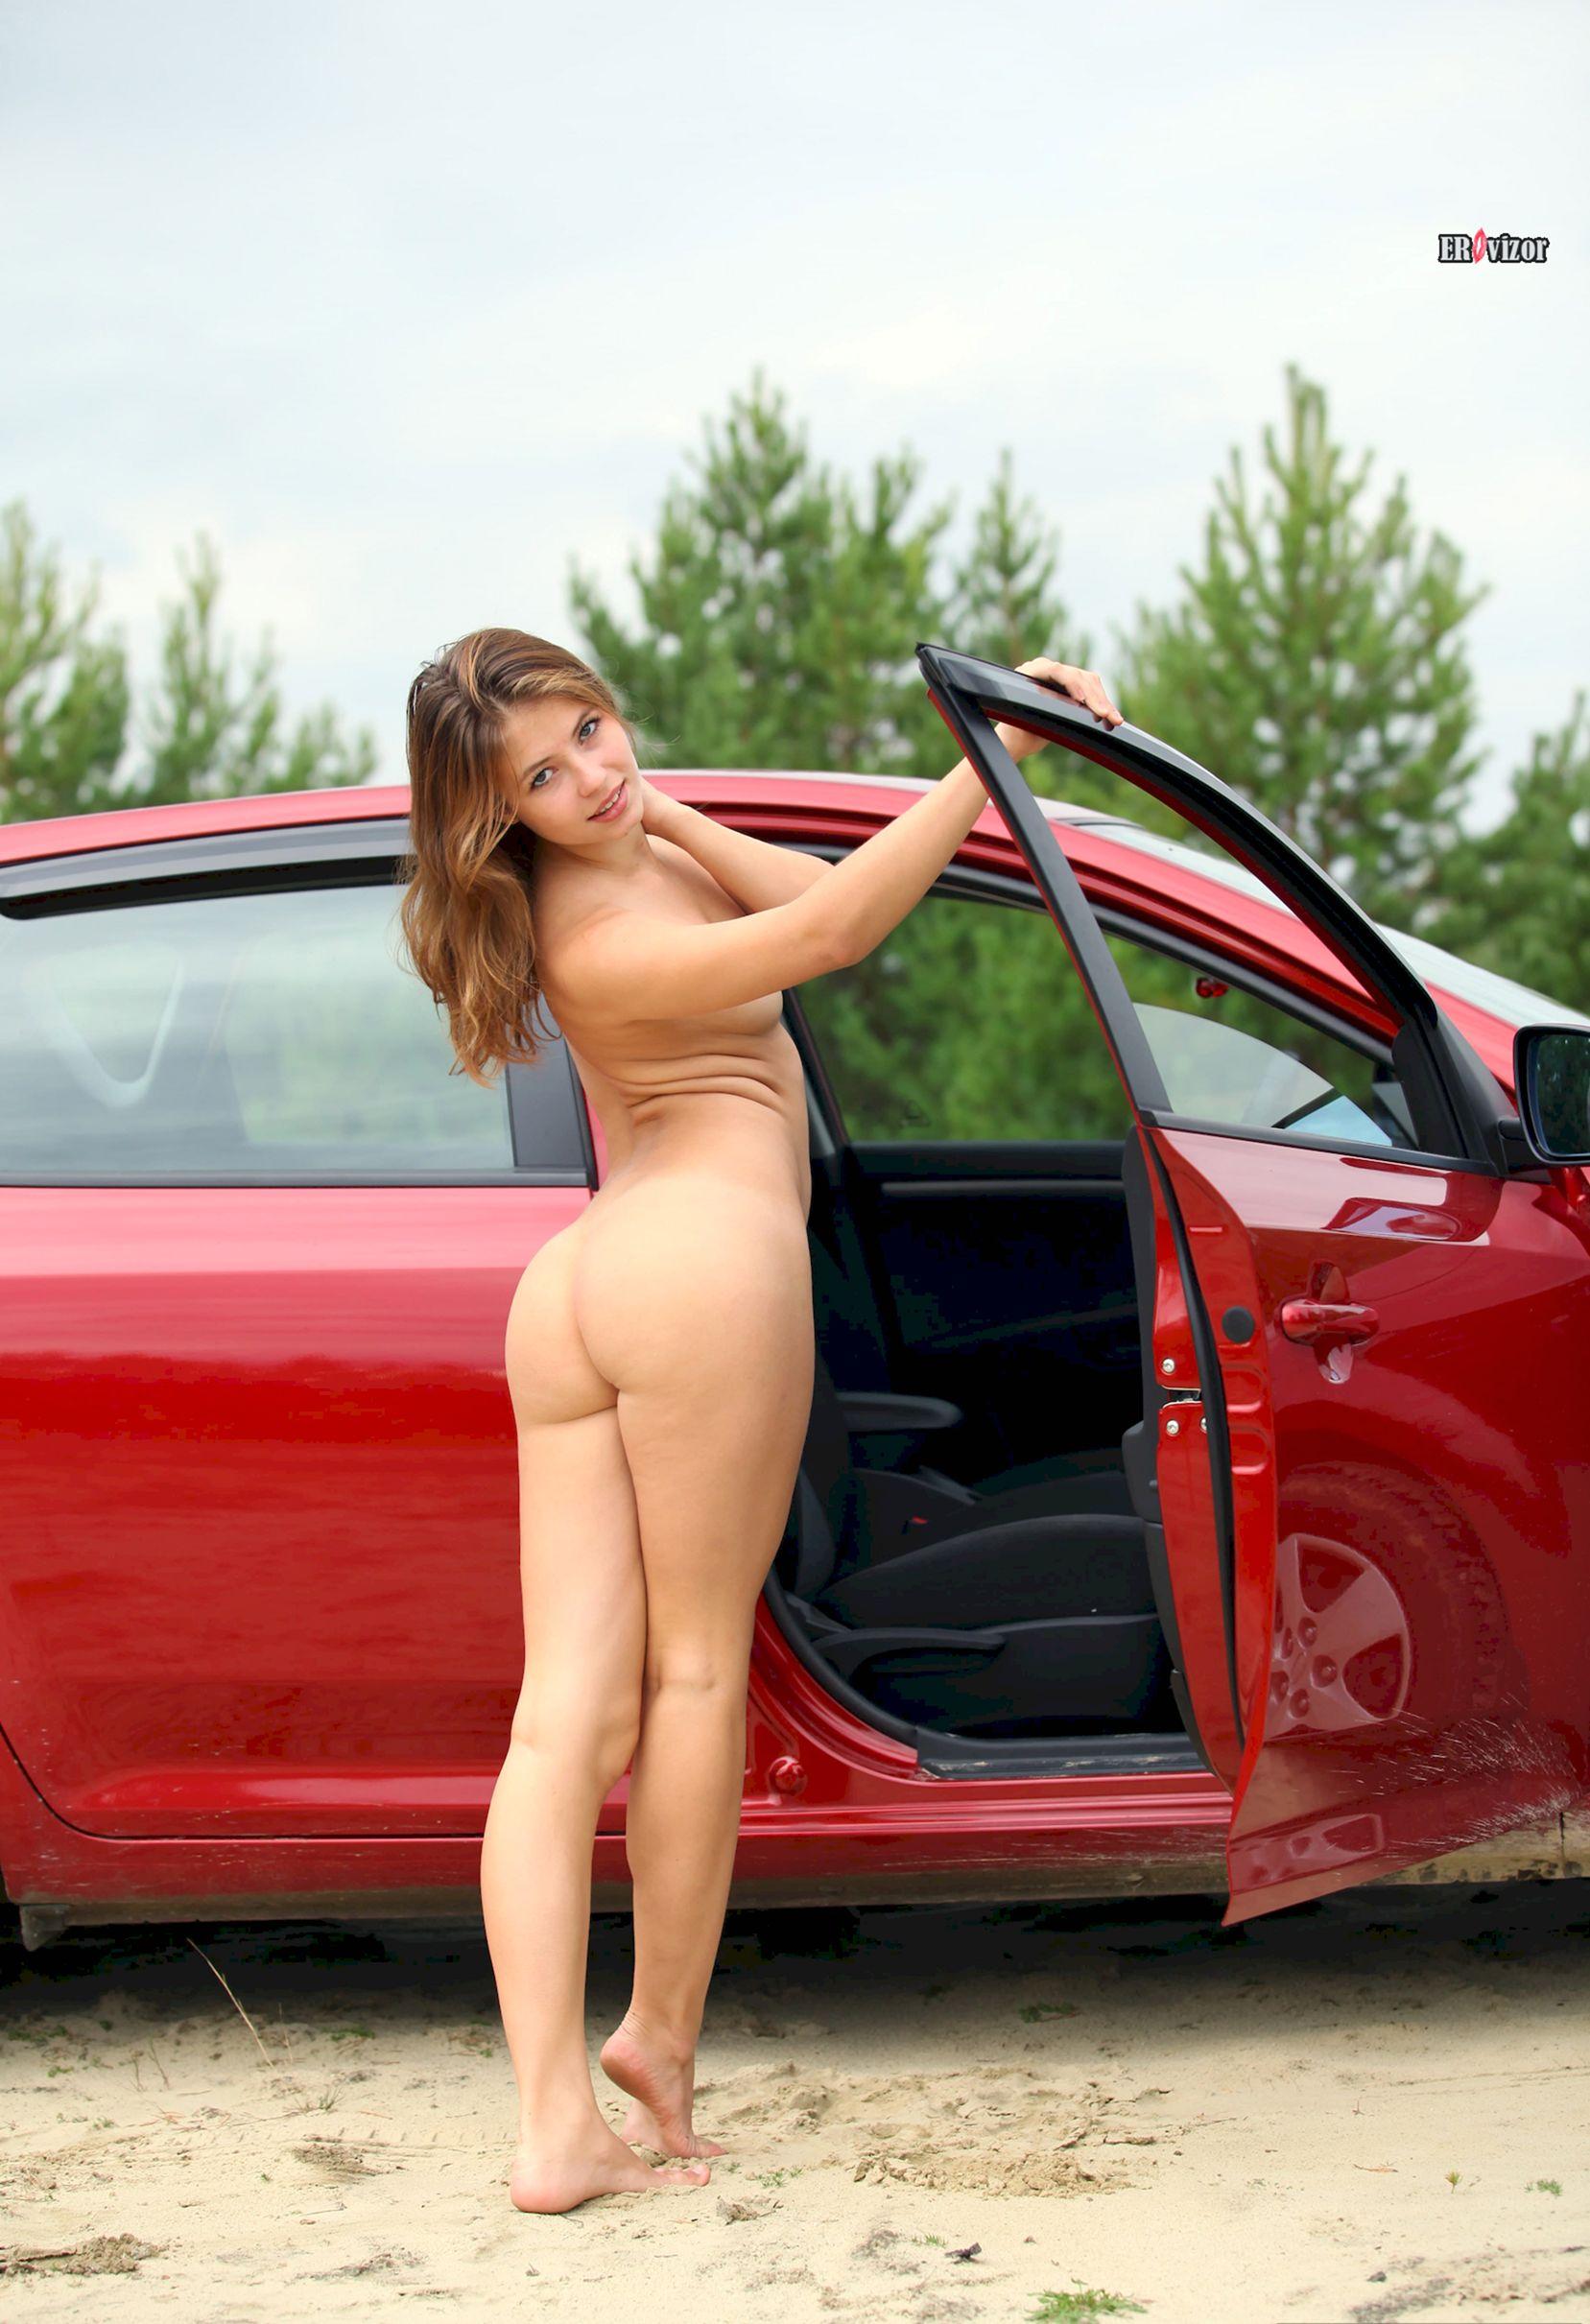 Viktoria-Aliko-with-Open-Pussy-in-Car-erovizor1 (13)